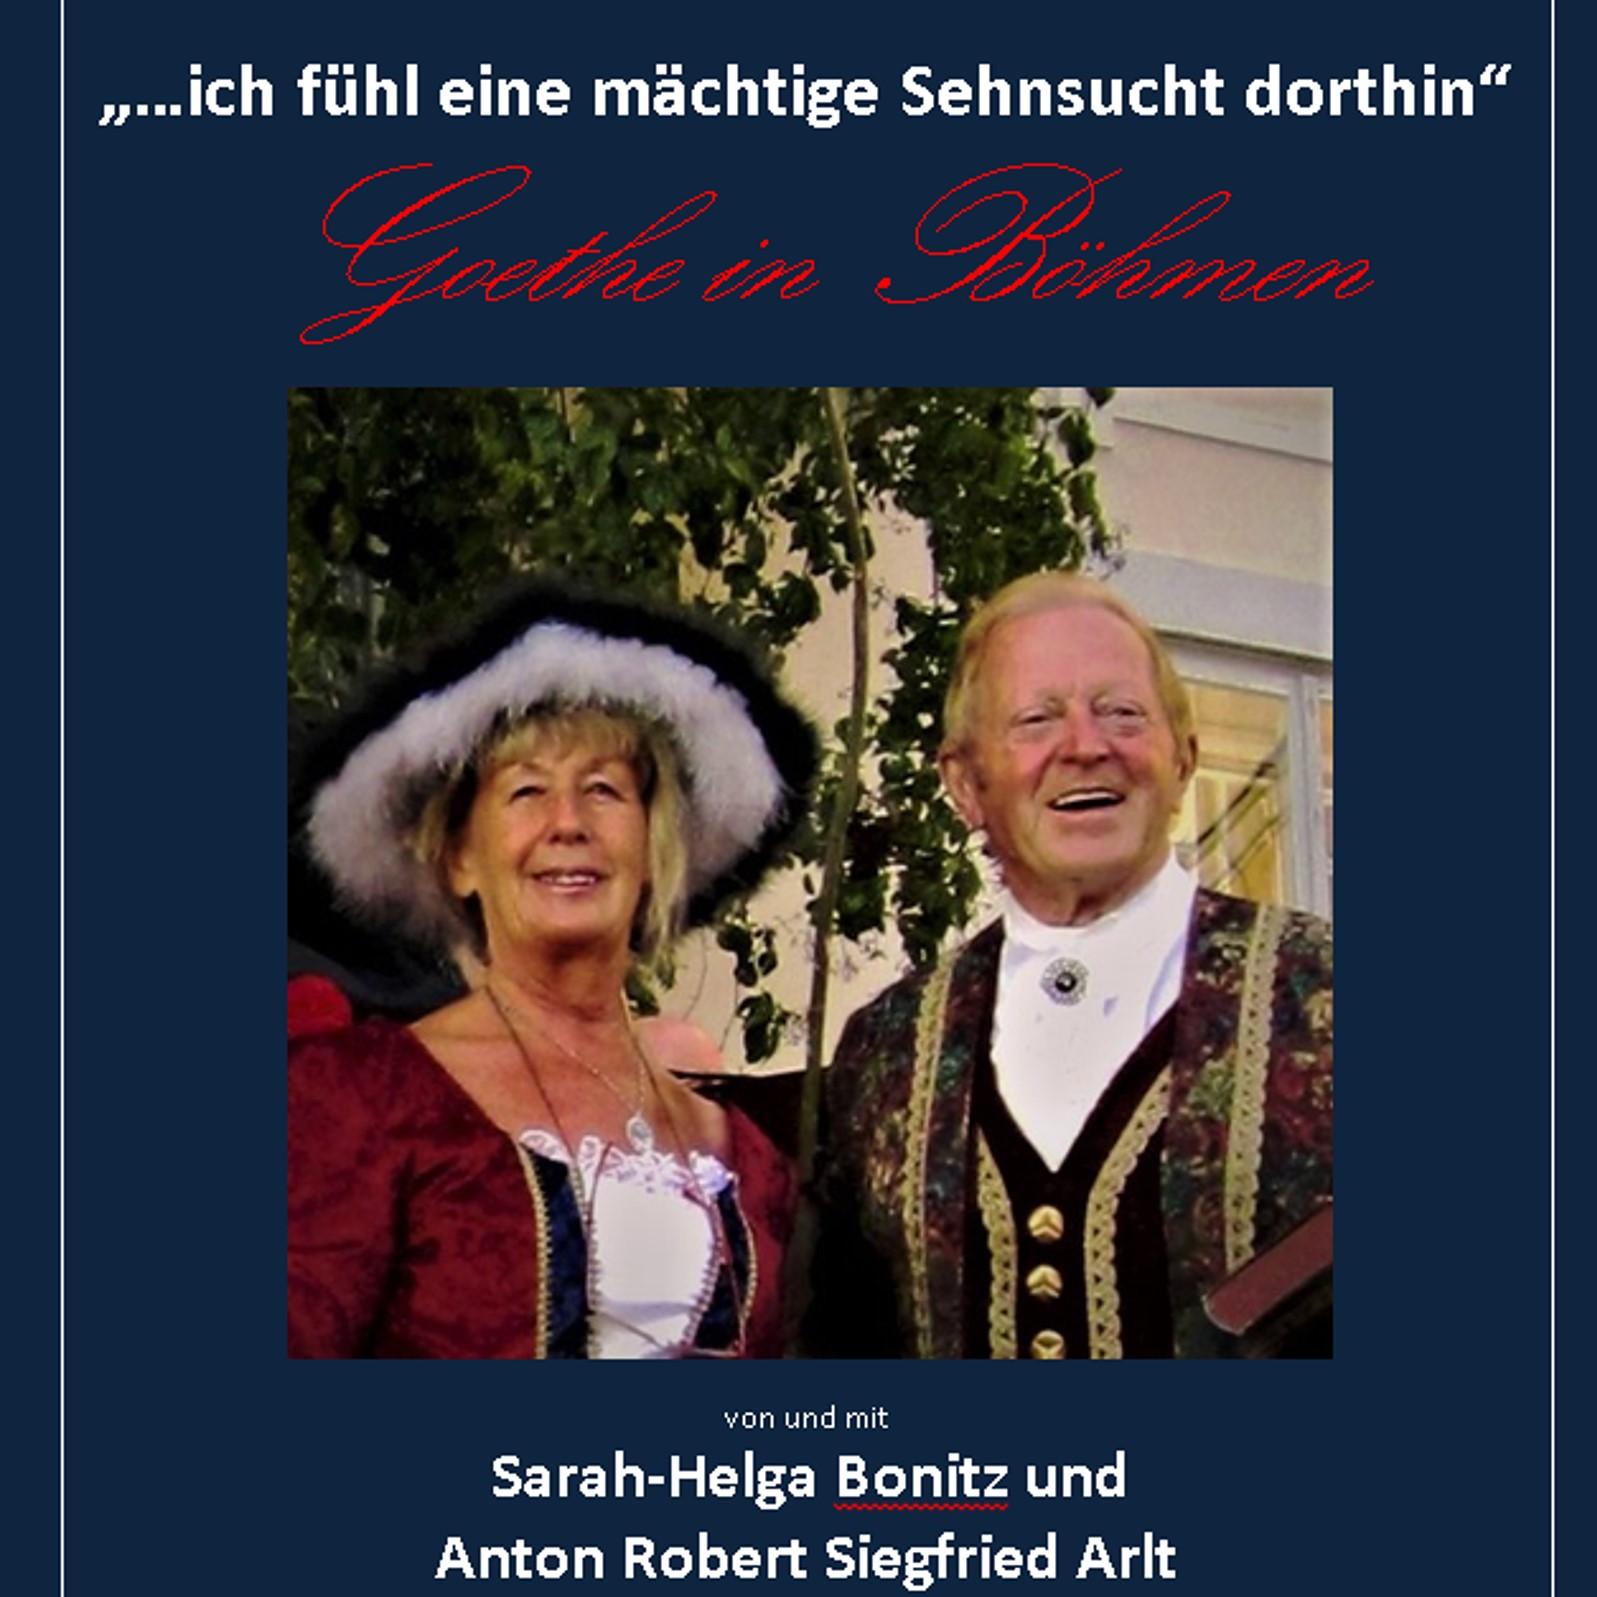 Goethe - 23 web